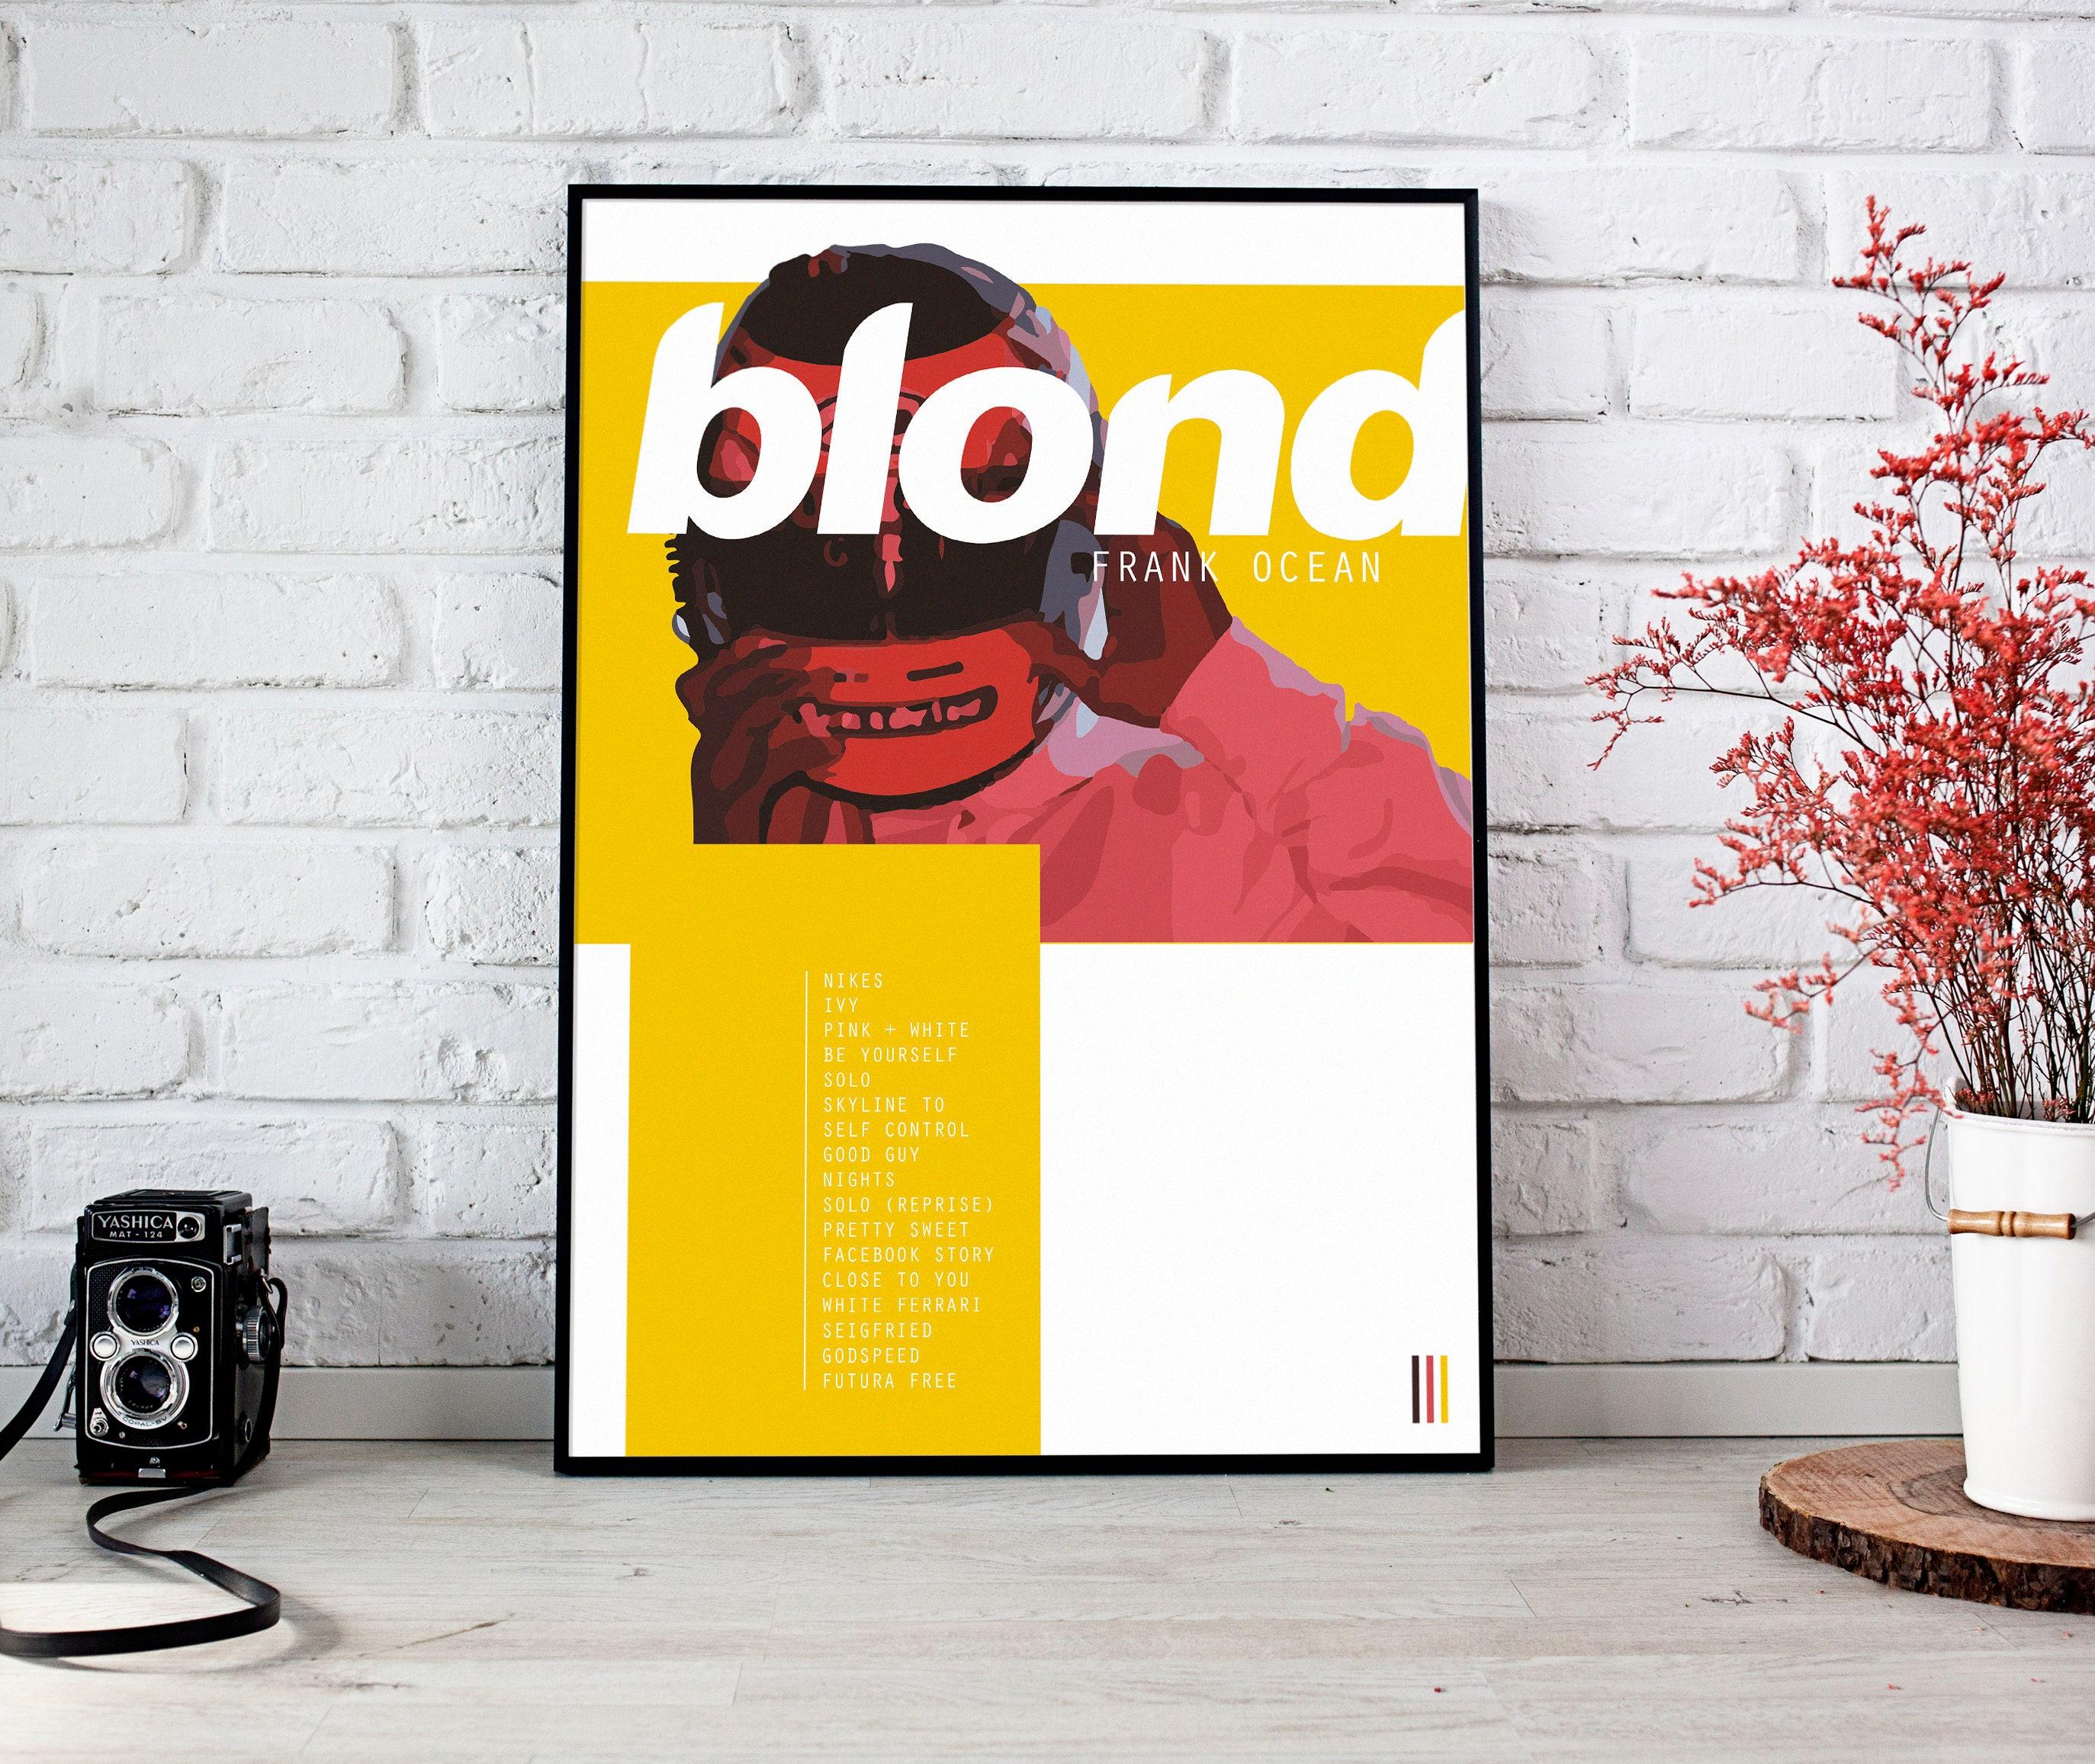 Frank ocean blonde poster frank ocean album art blonde